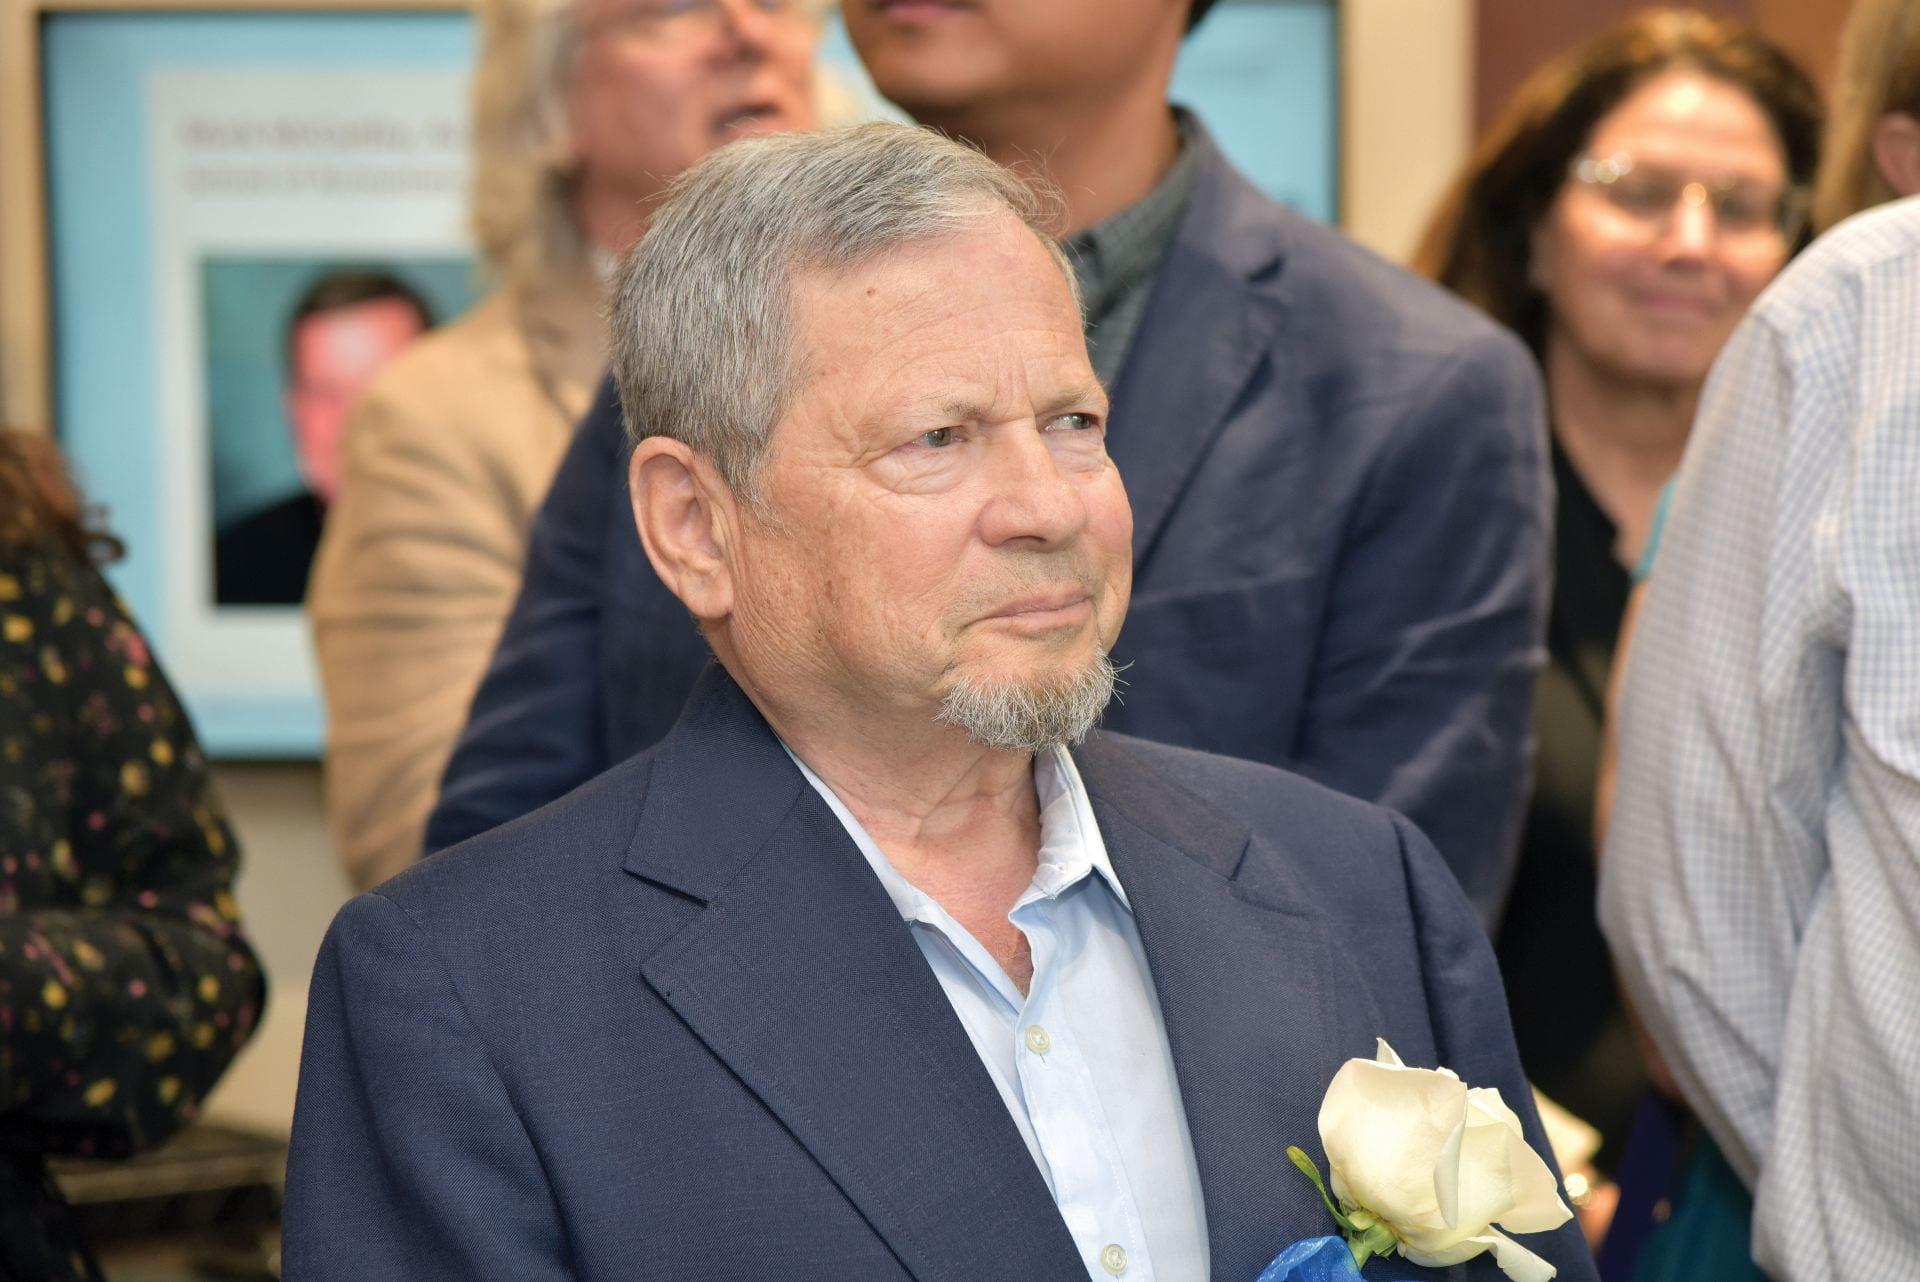 Staff member Ilya Meiertal retired after a 26-year career at DePaul.